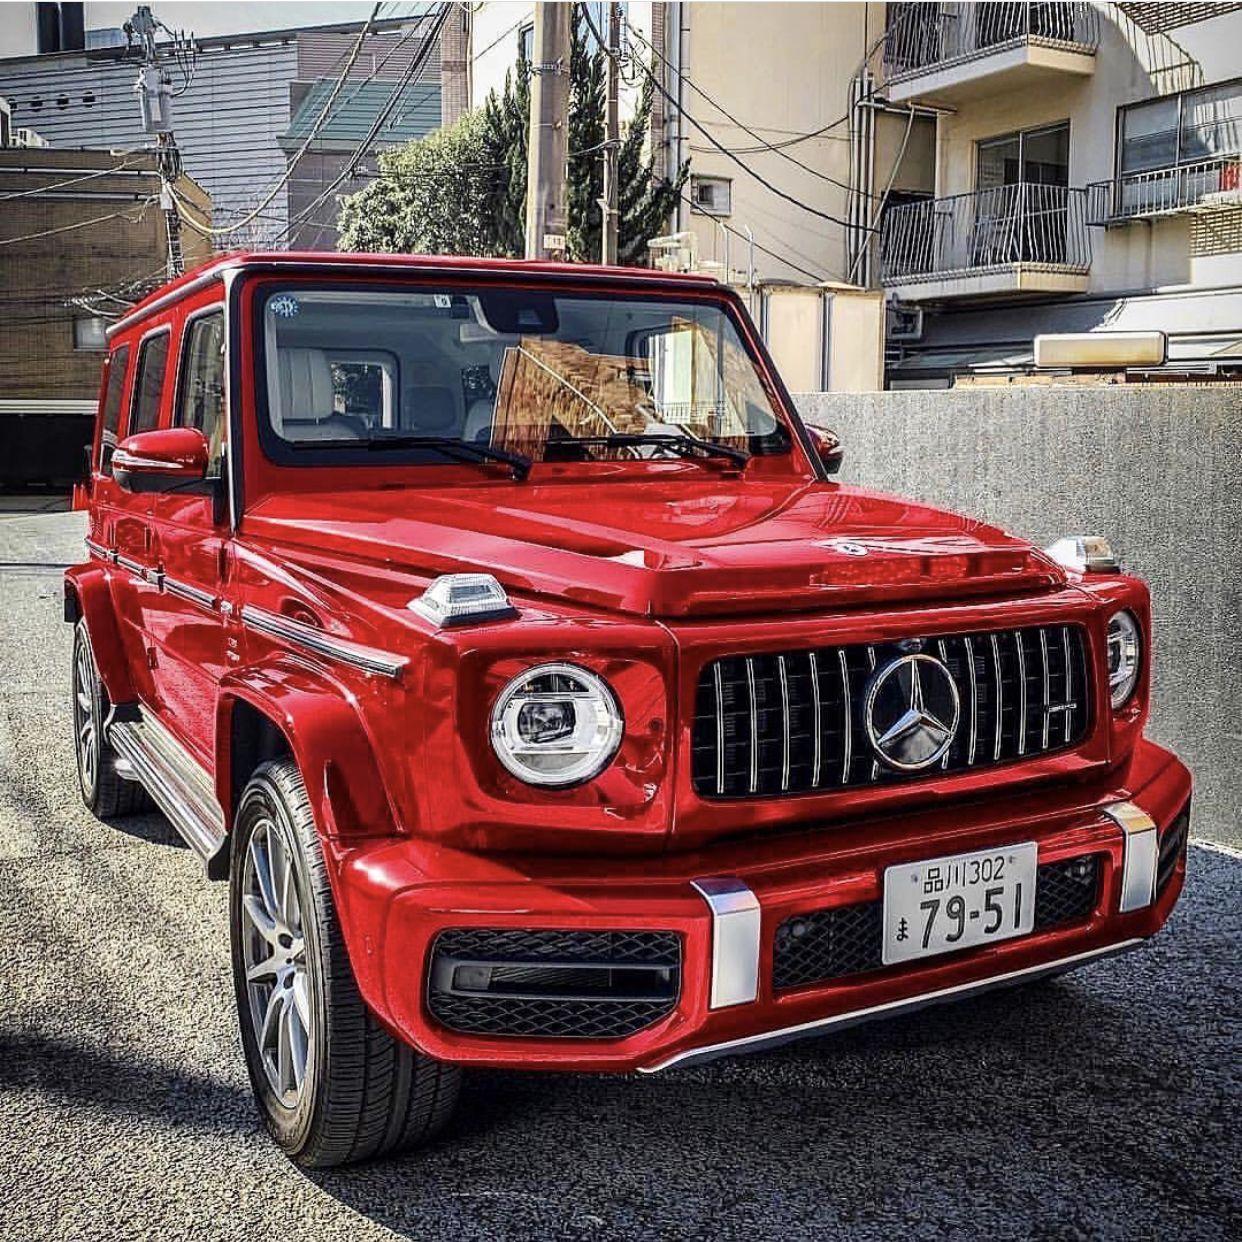 G Class Red Mercedes Benz In 2020 Top Luxury Cars G Class Best